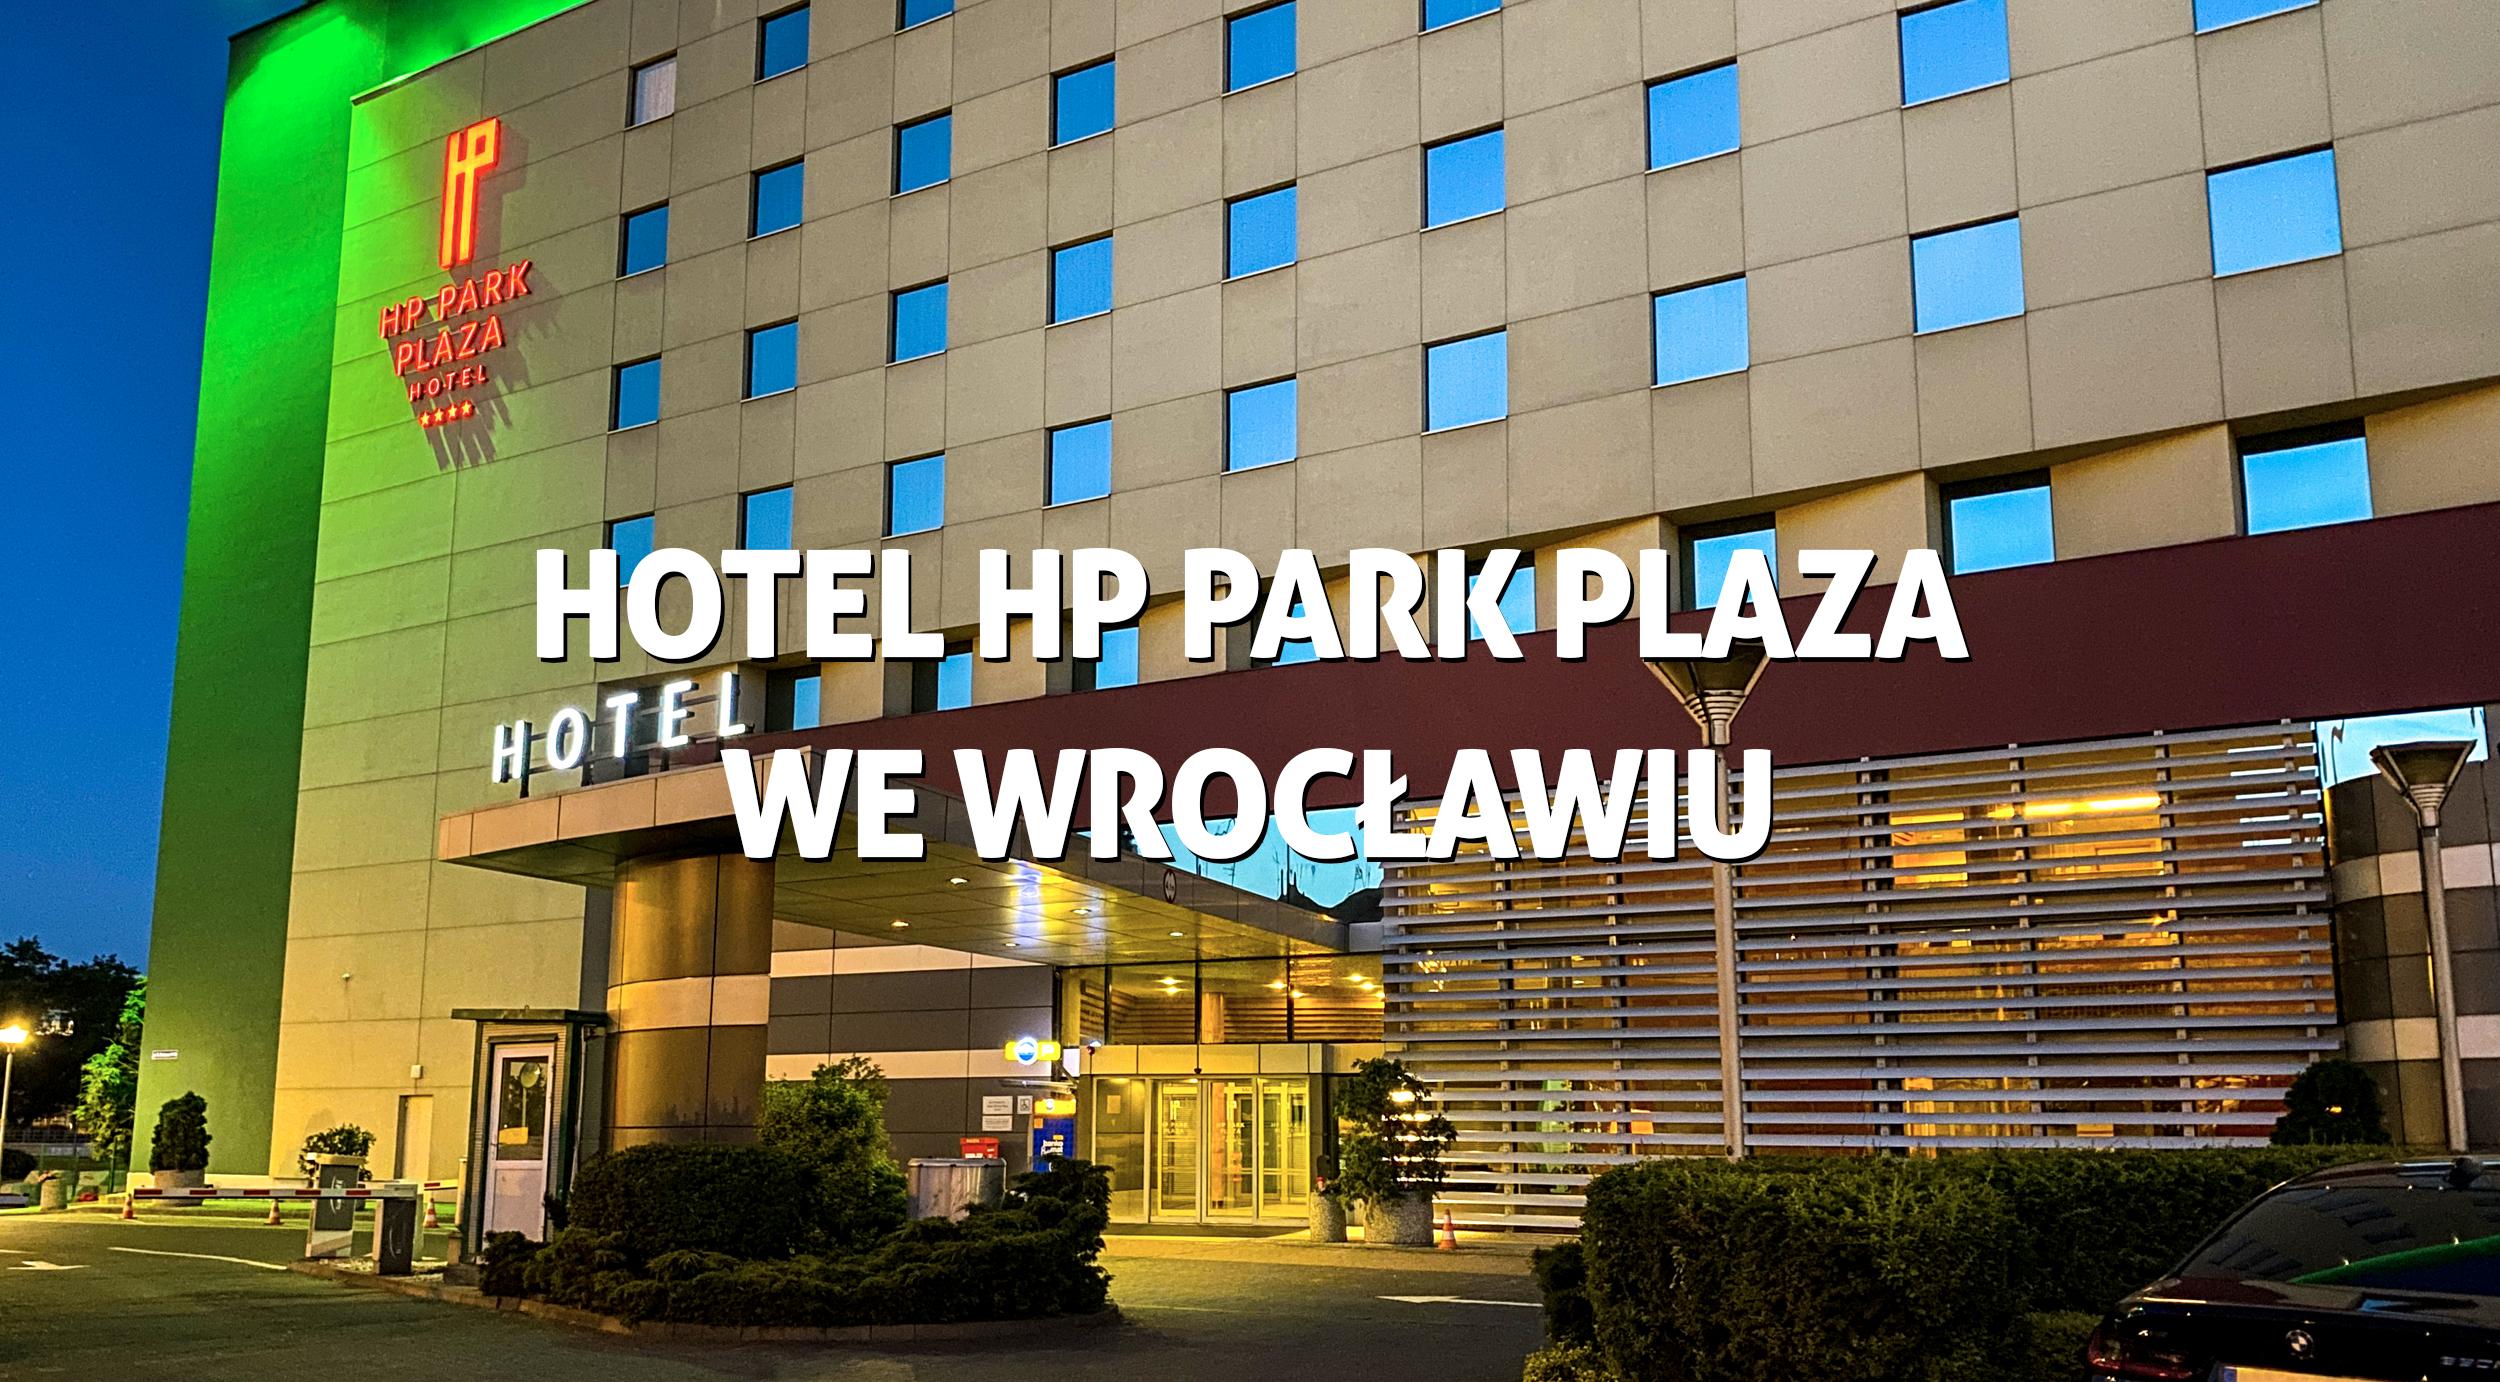 HOTEL HP PARK PLAZA WEWROCŁAWIU